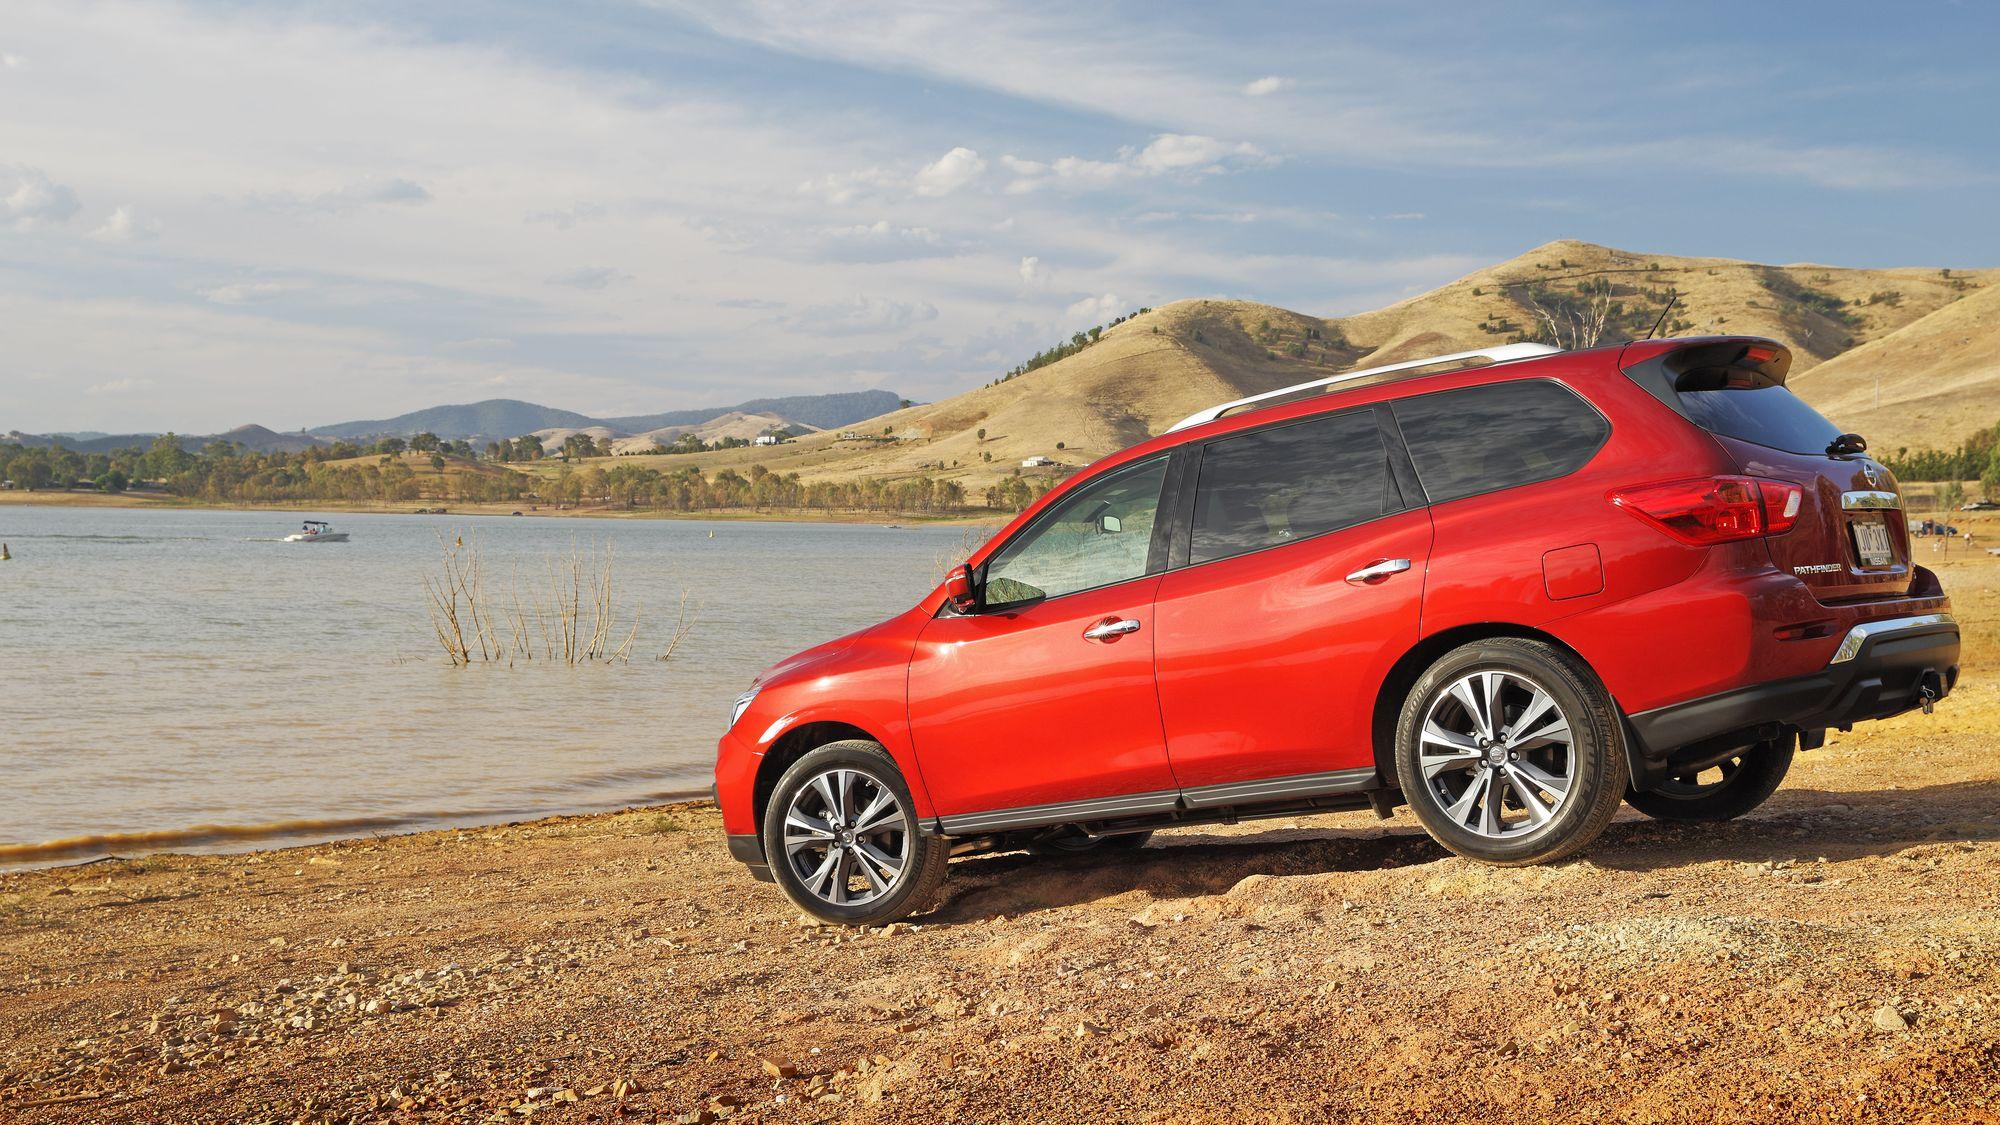 Nissan Pathfinder 2018 Range Review